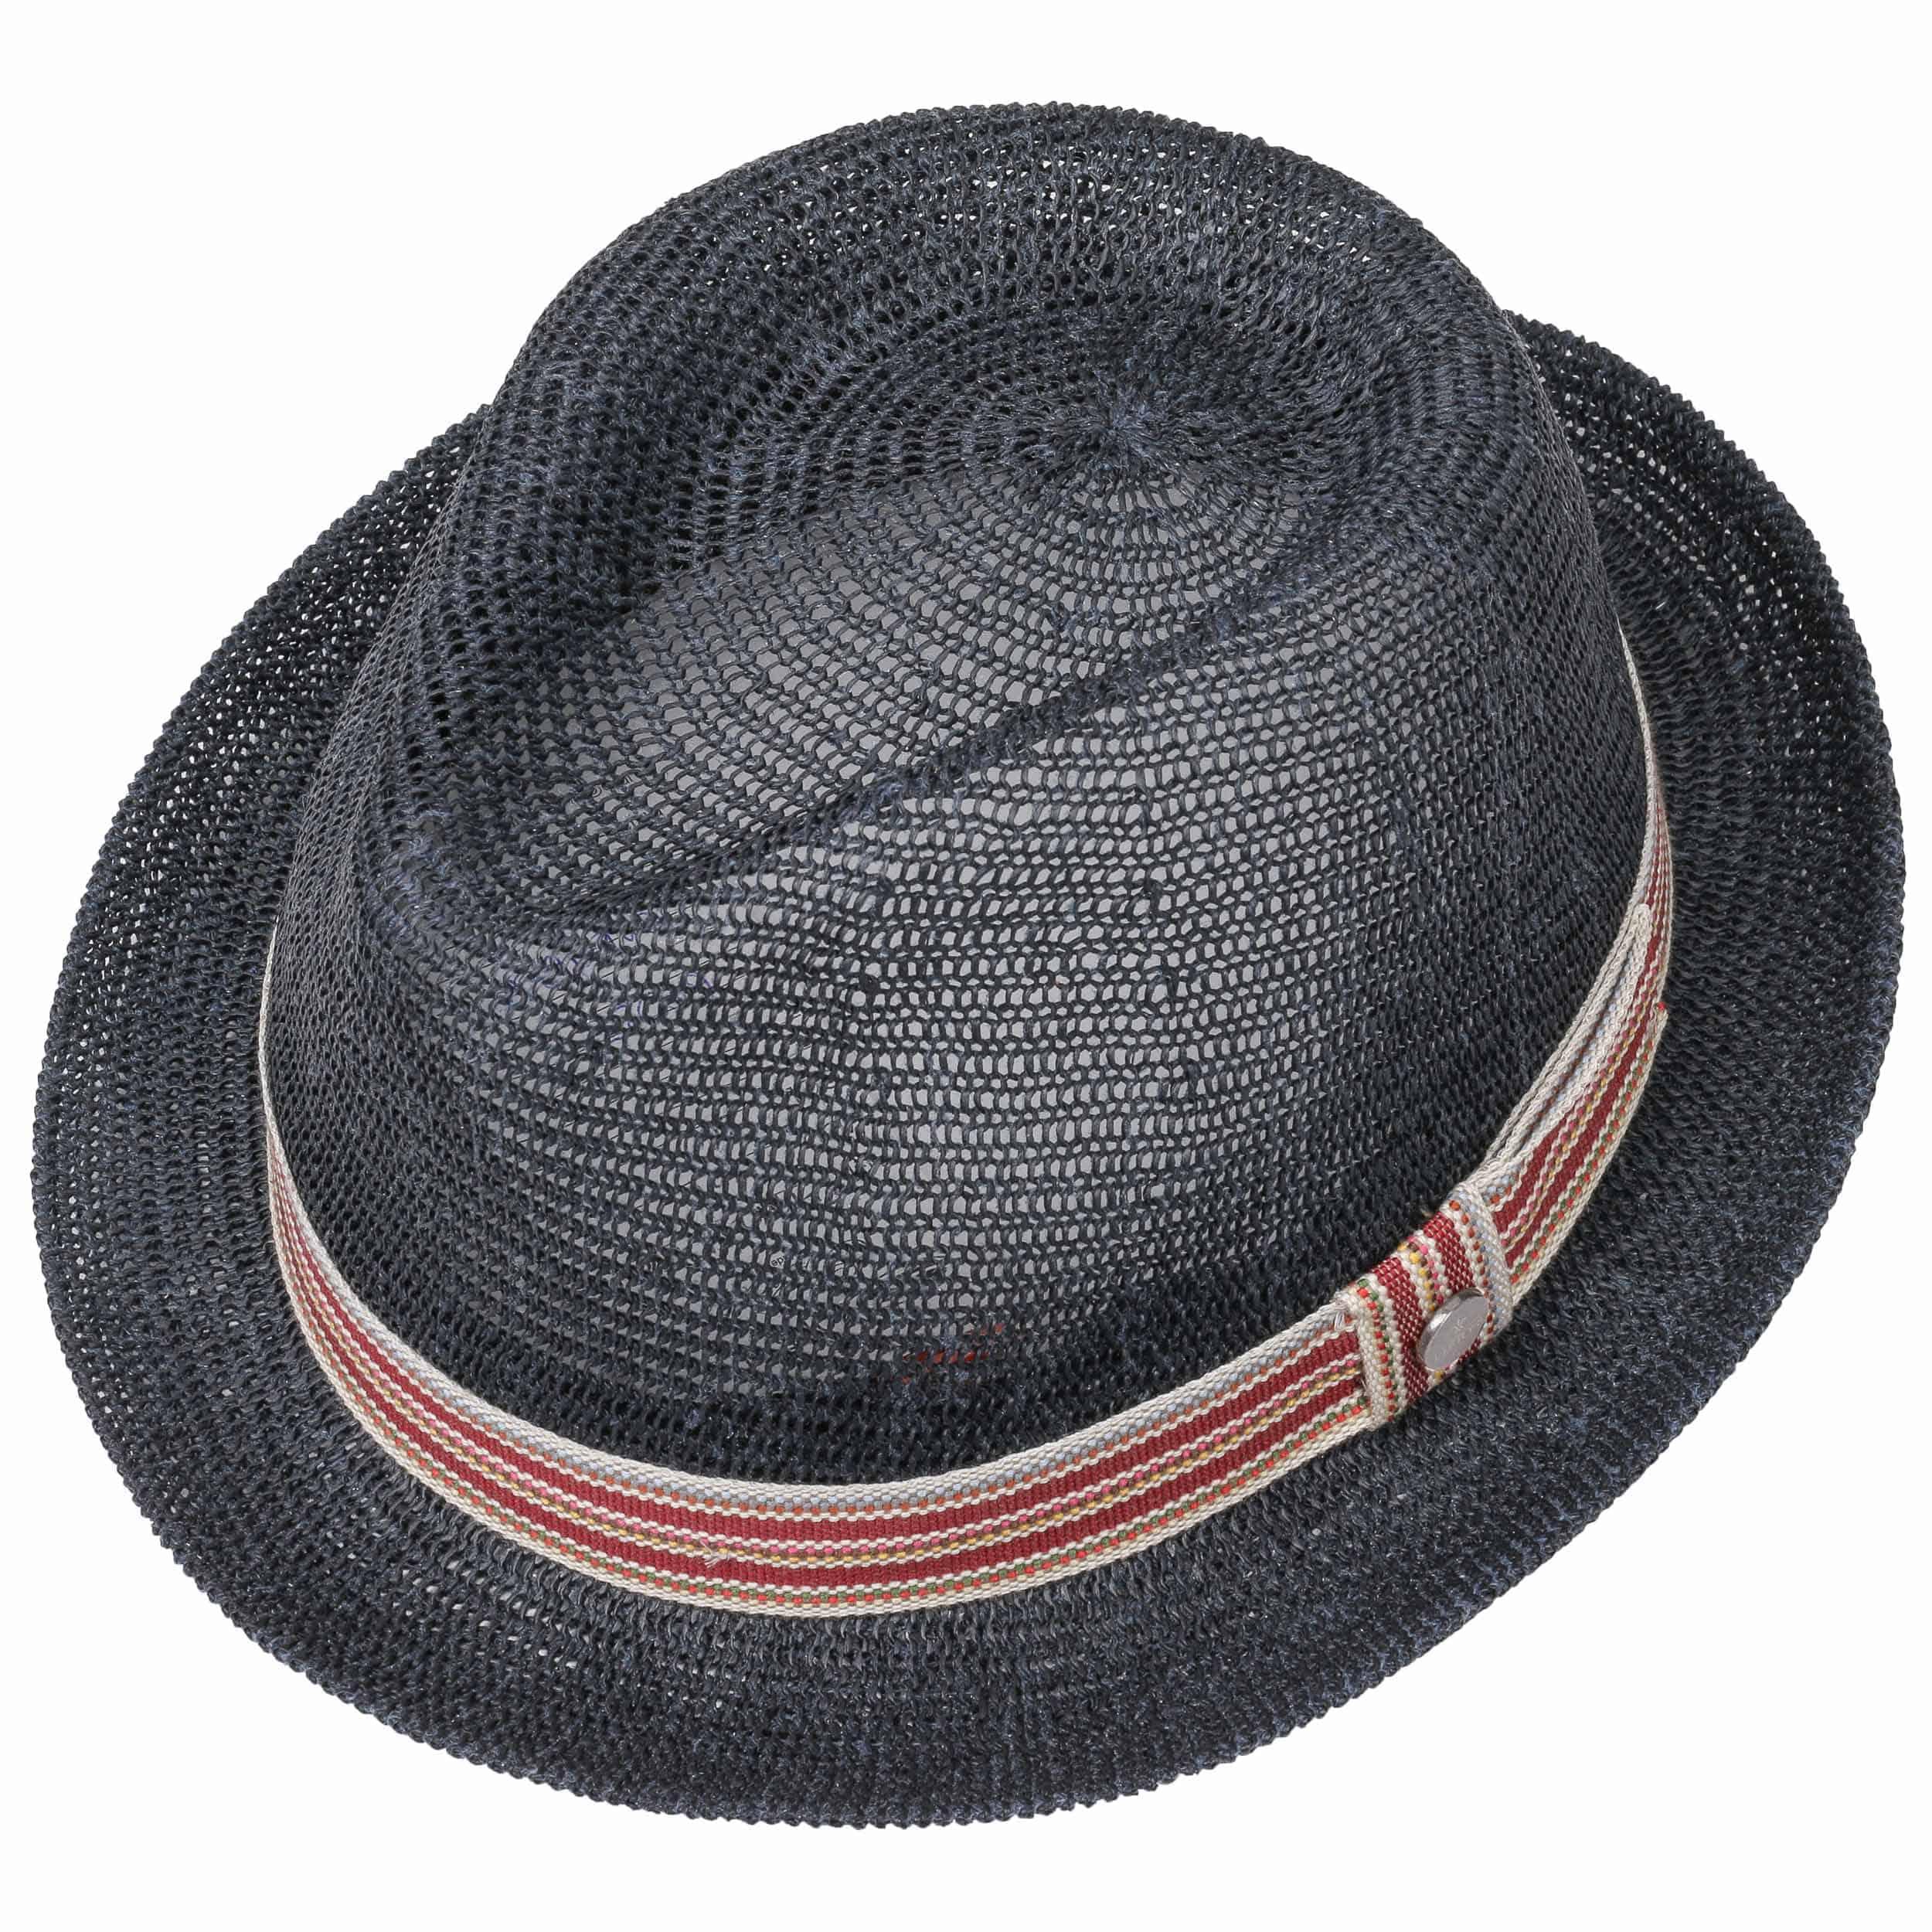 Authentic Outlet Browse Steven Linen Hat by Lierys Sun hats Lierys 12ZQK